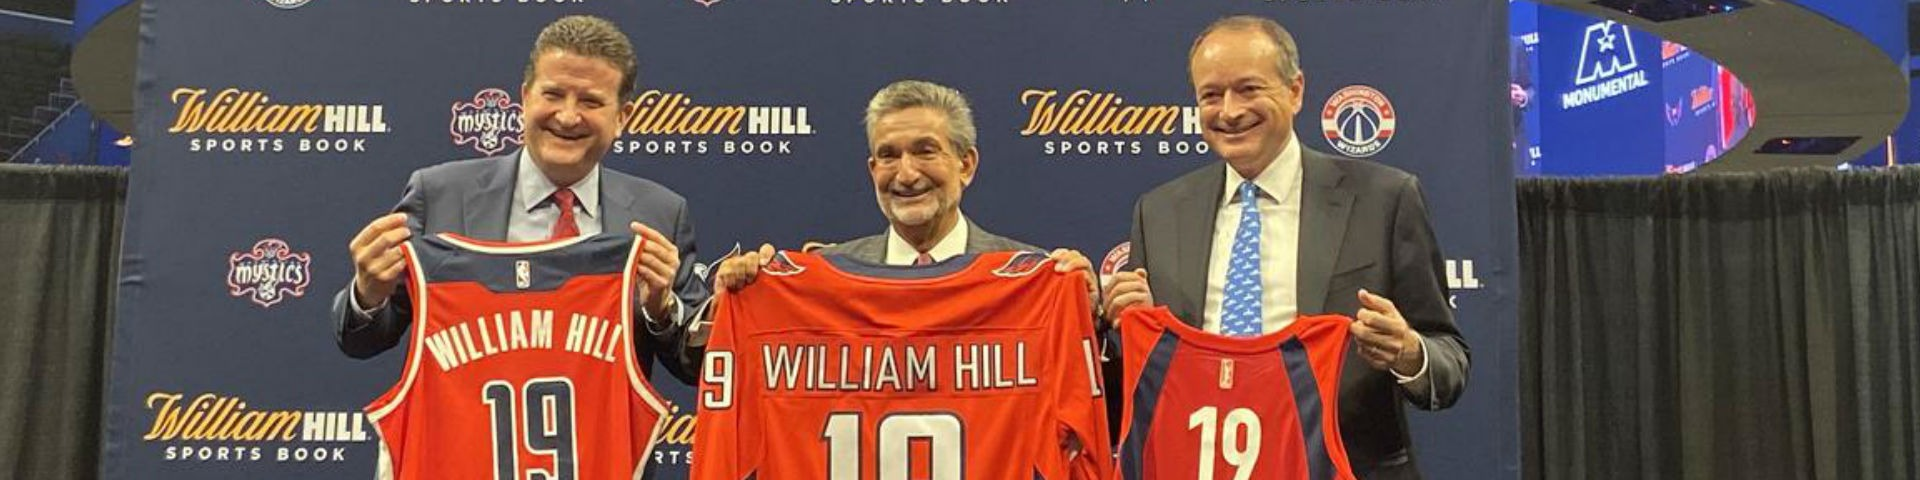 БК William Hill стала партнёром Monumental Sports & Entertainment